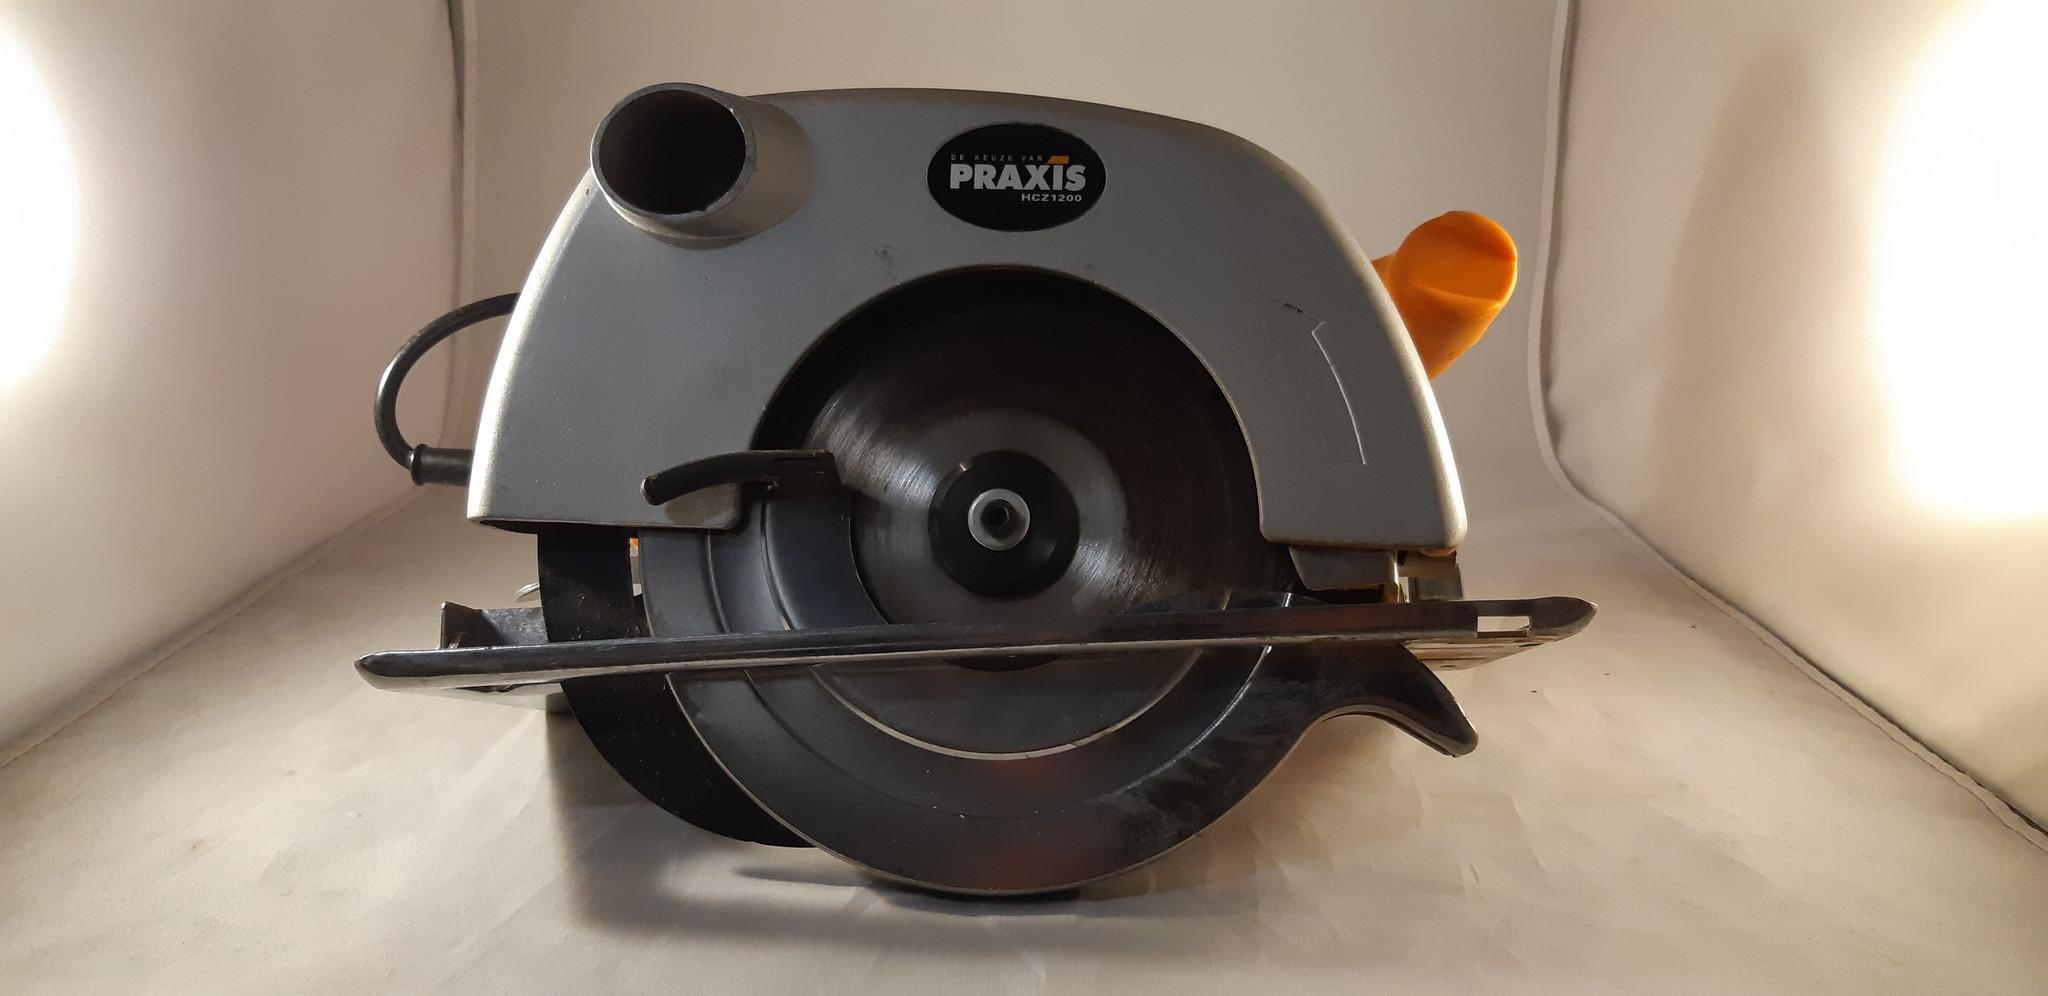 praxis Praxis HCZ1200 Cirkelzaag